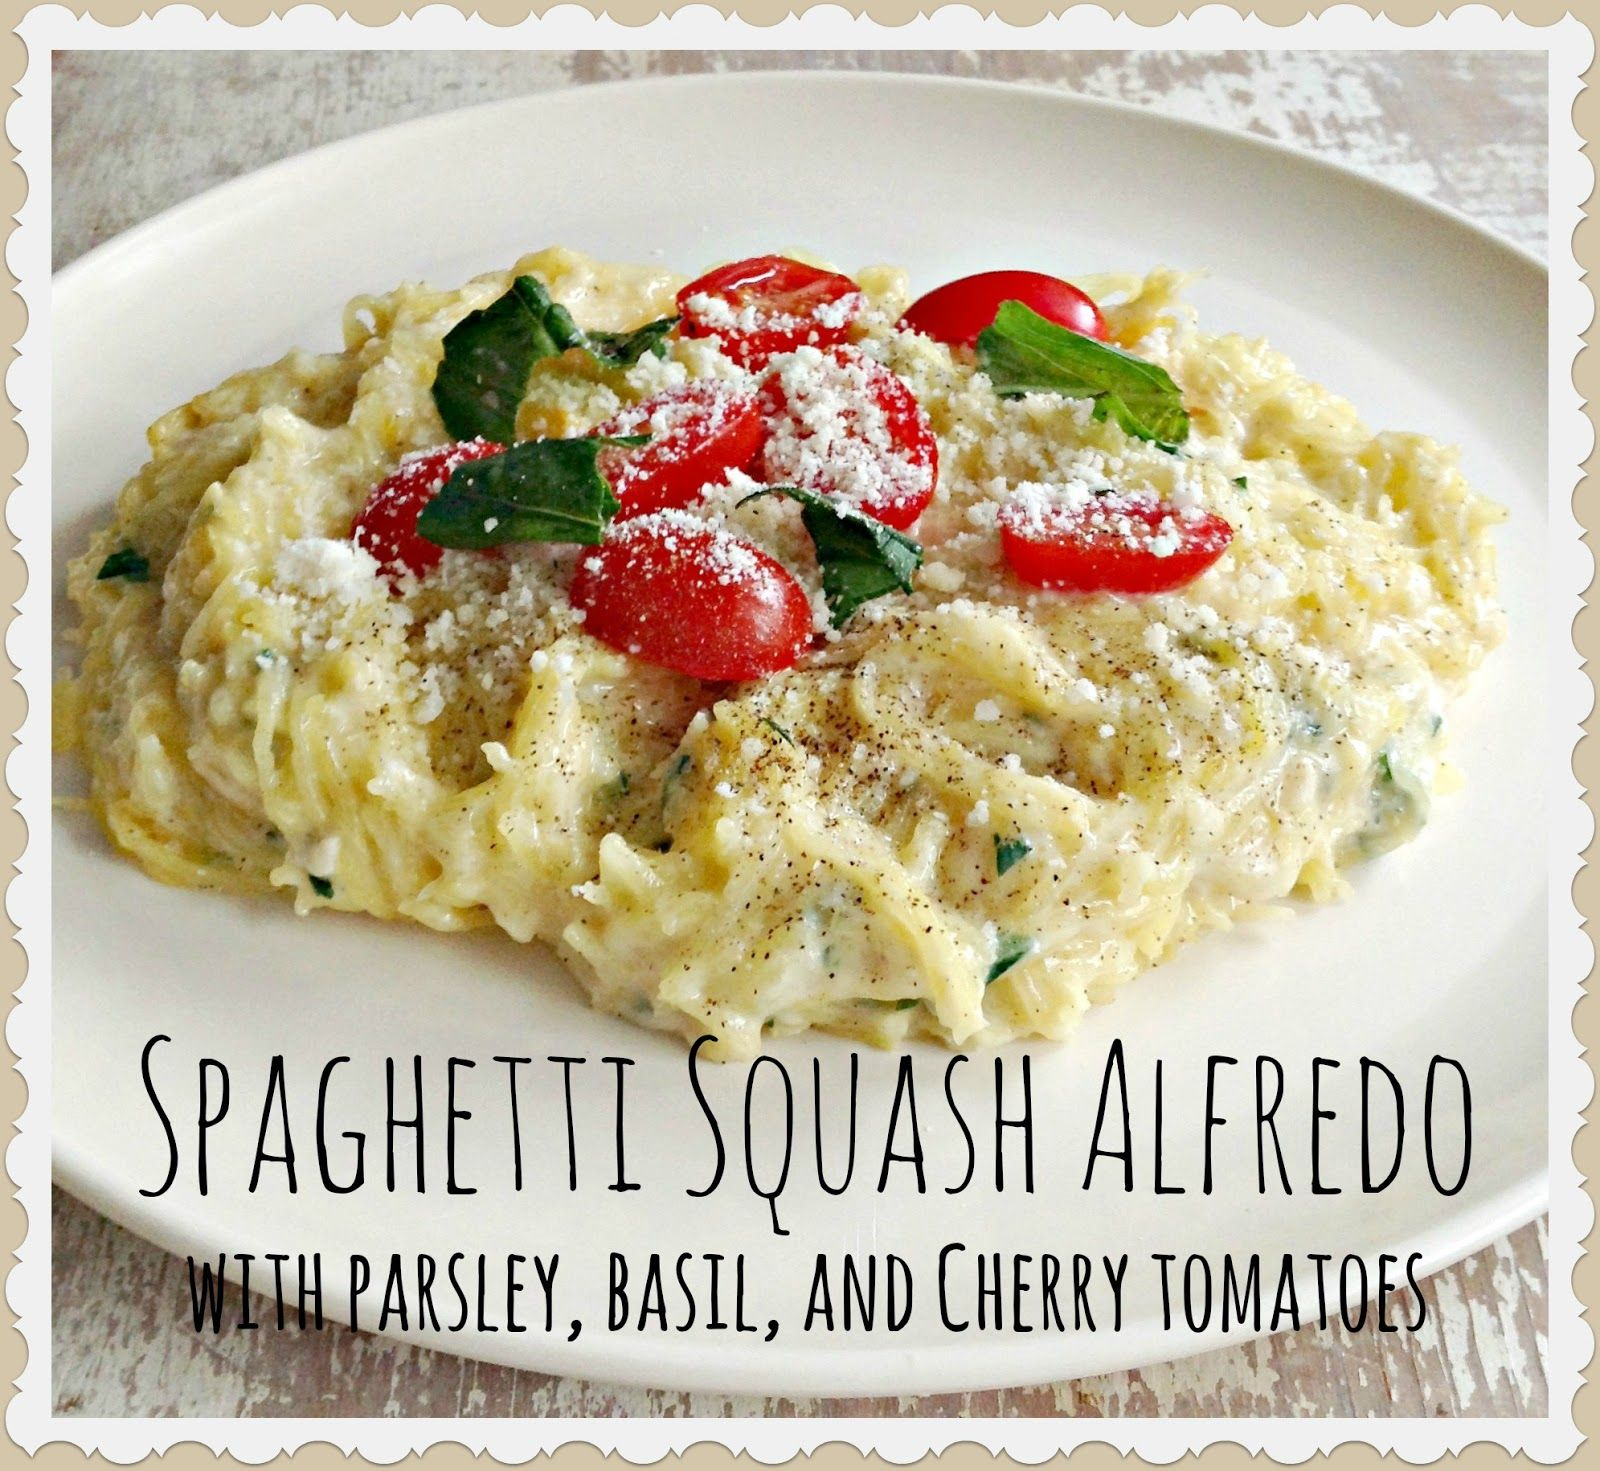 All Hail the Spaghetti Squash! :) Spaghetti Squash Alfredo with Parsley, Basil, and Cherry Tomatoes